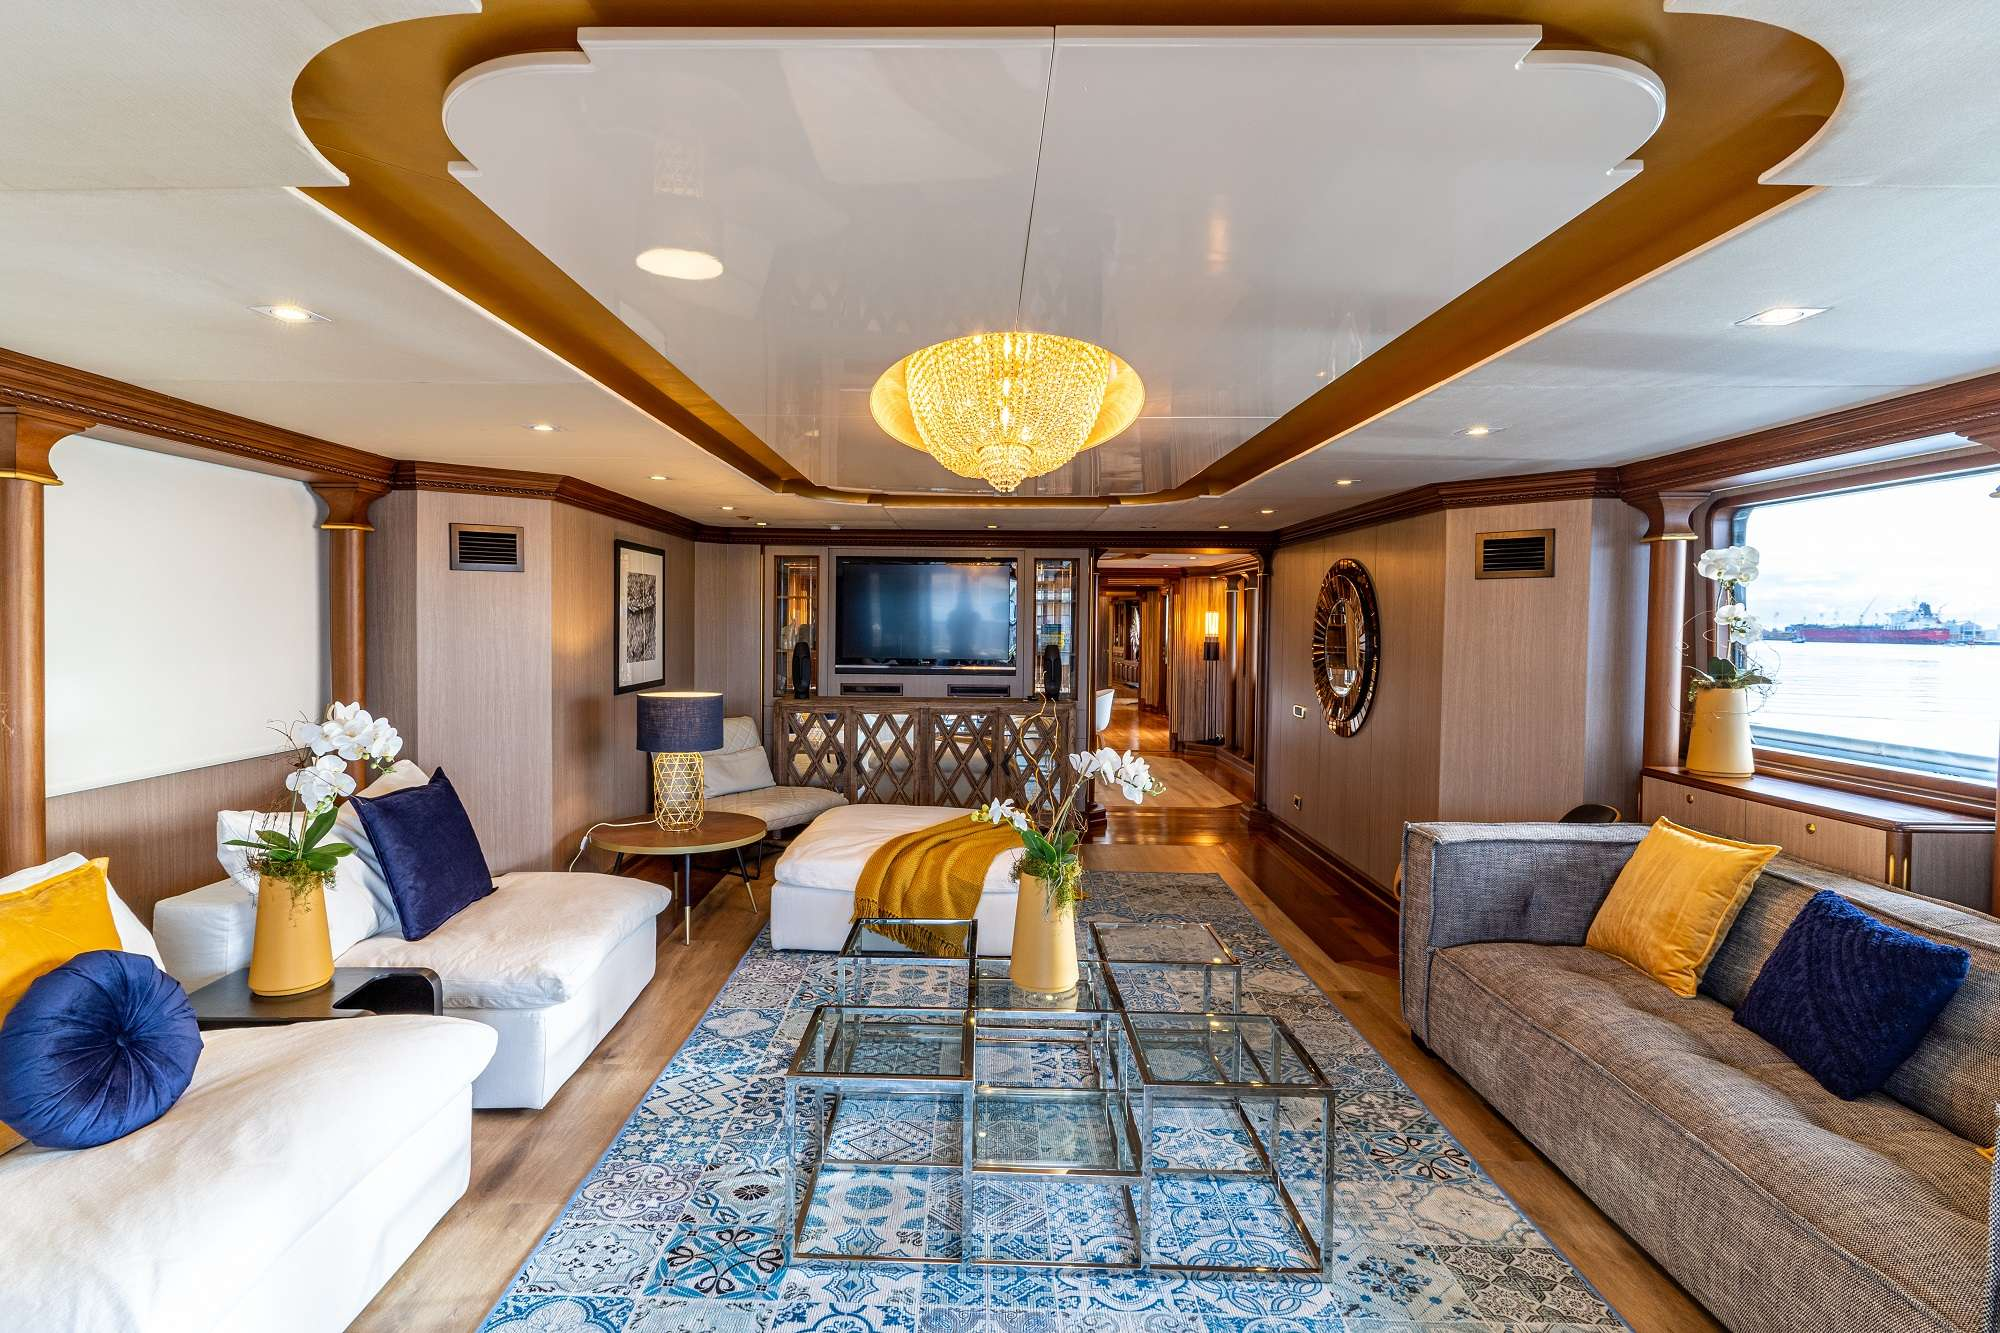 Image of iRama yacht #2